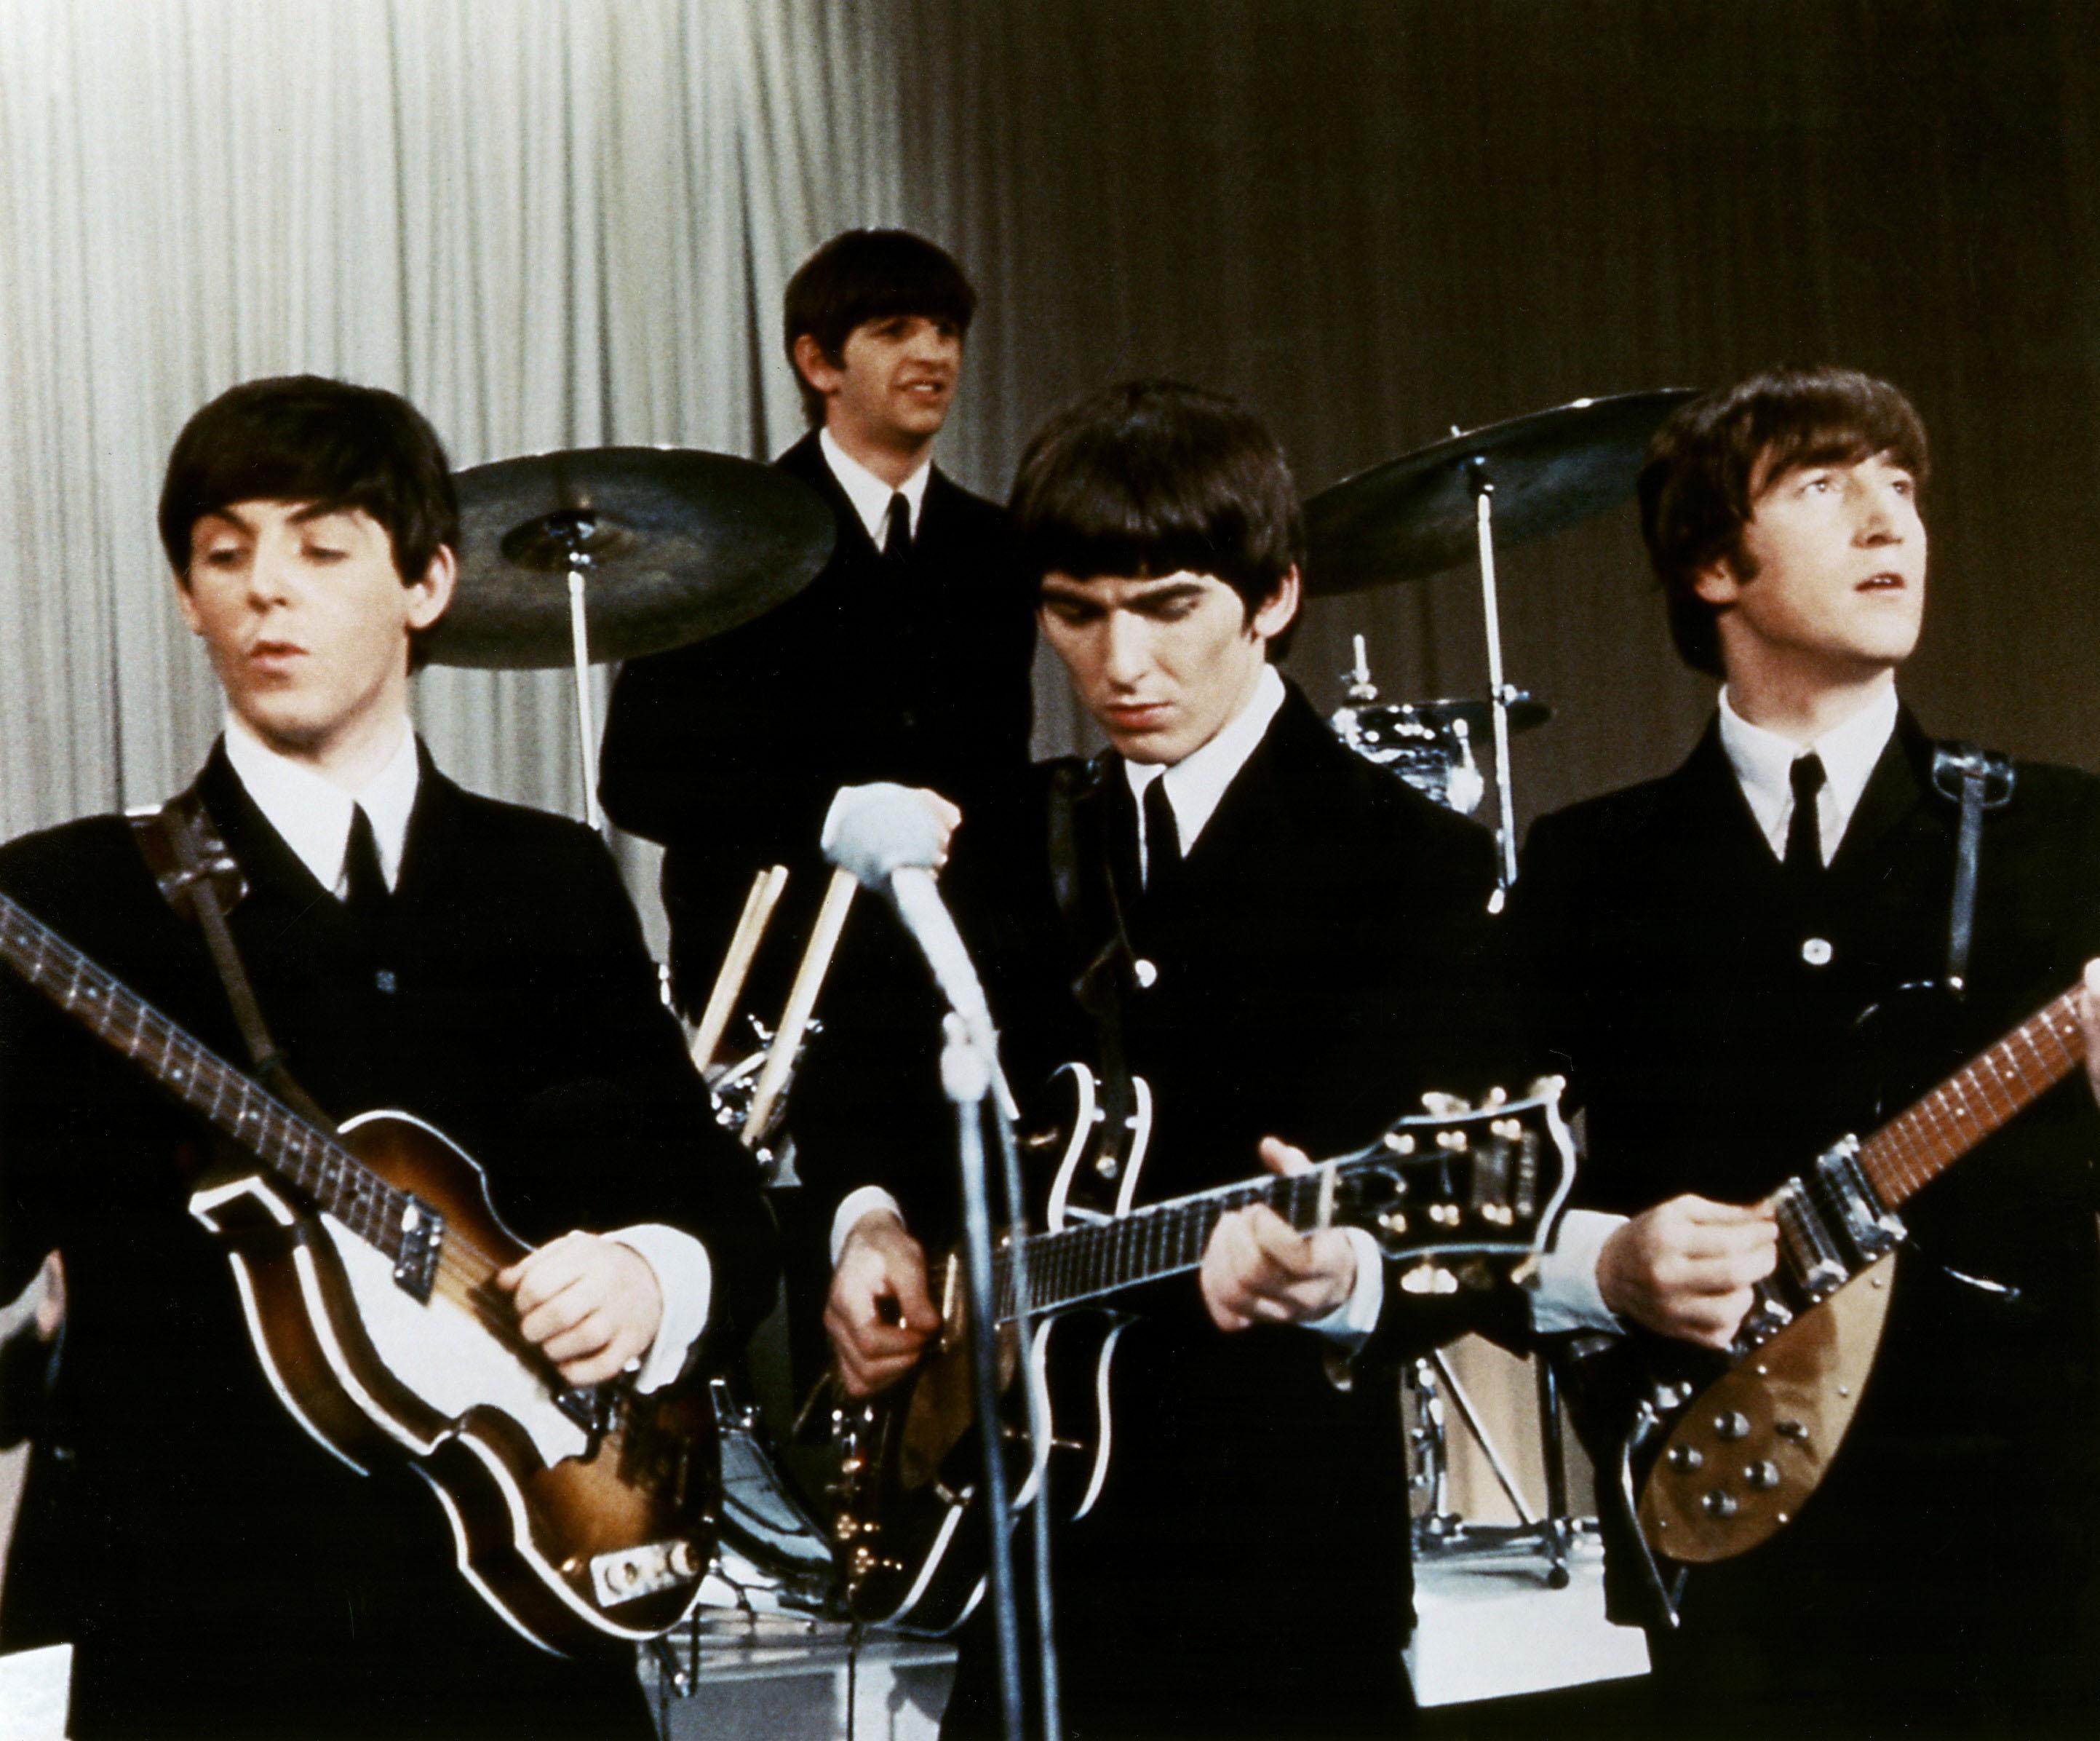 The Beatles 3 Hd Wallpaper